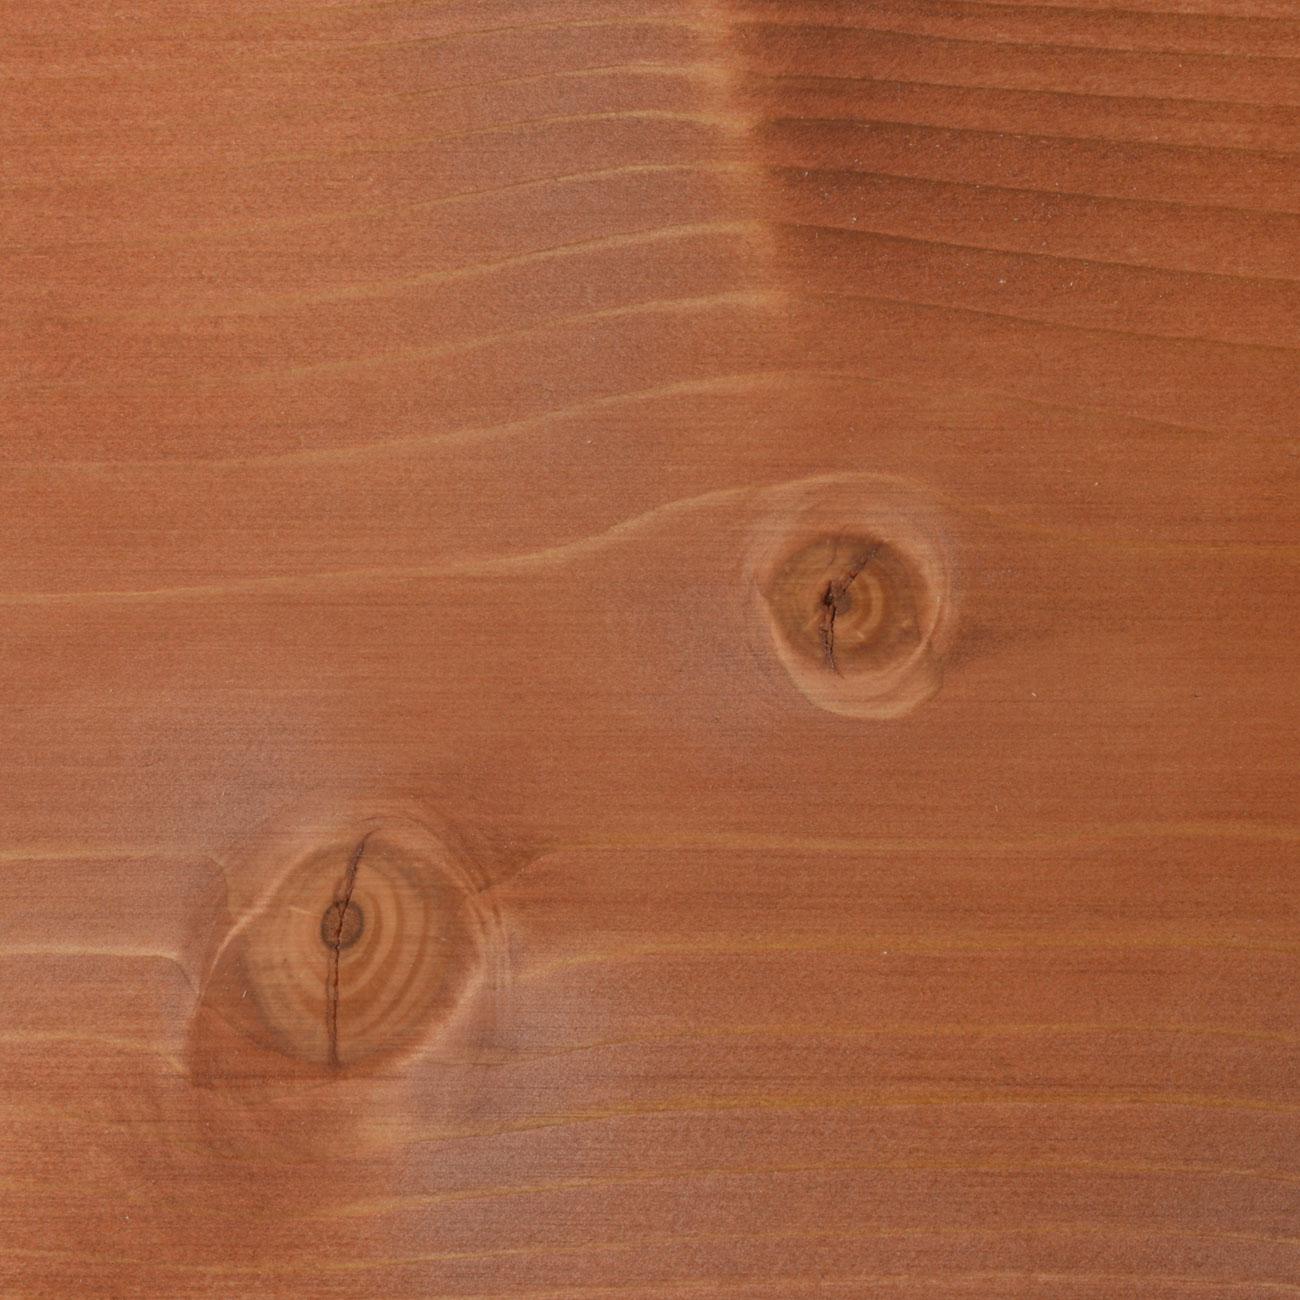 117.Fichte geschliffen mit Faxe Speziallauge zzgl. 5% Faxe Combicolor rotbraun gelaugt und mit Faxe Holzbodenöl natur geölt